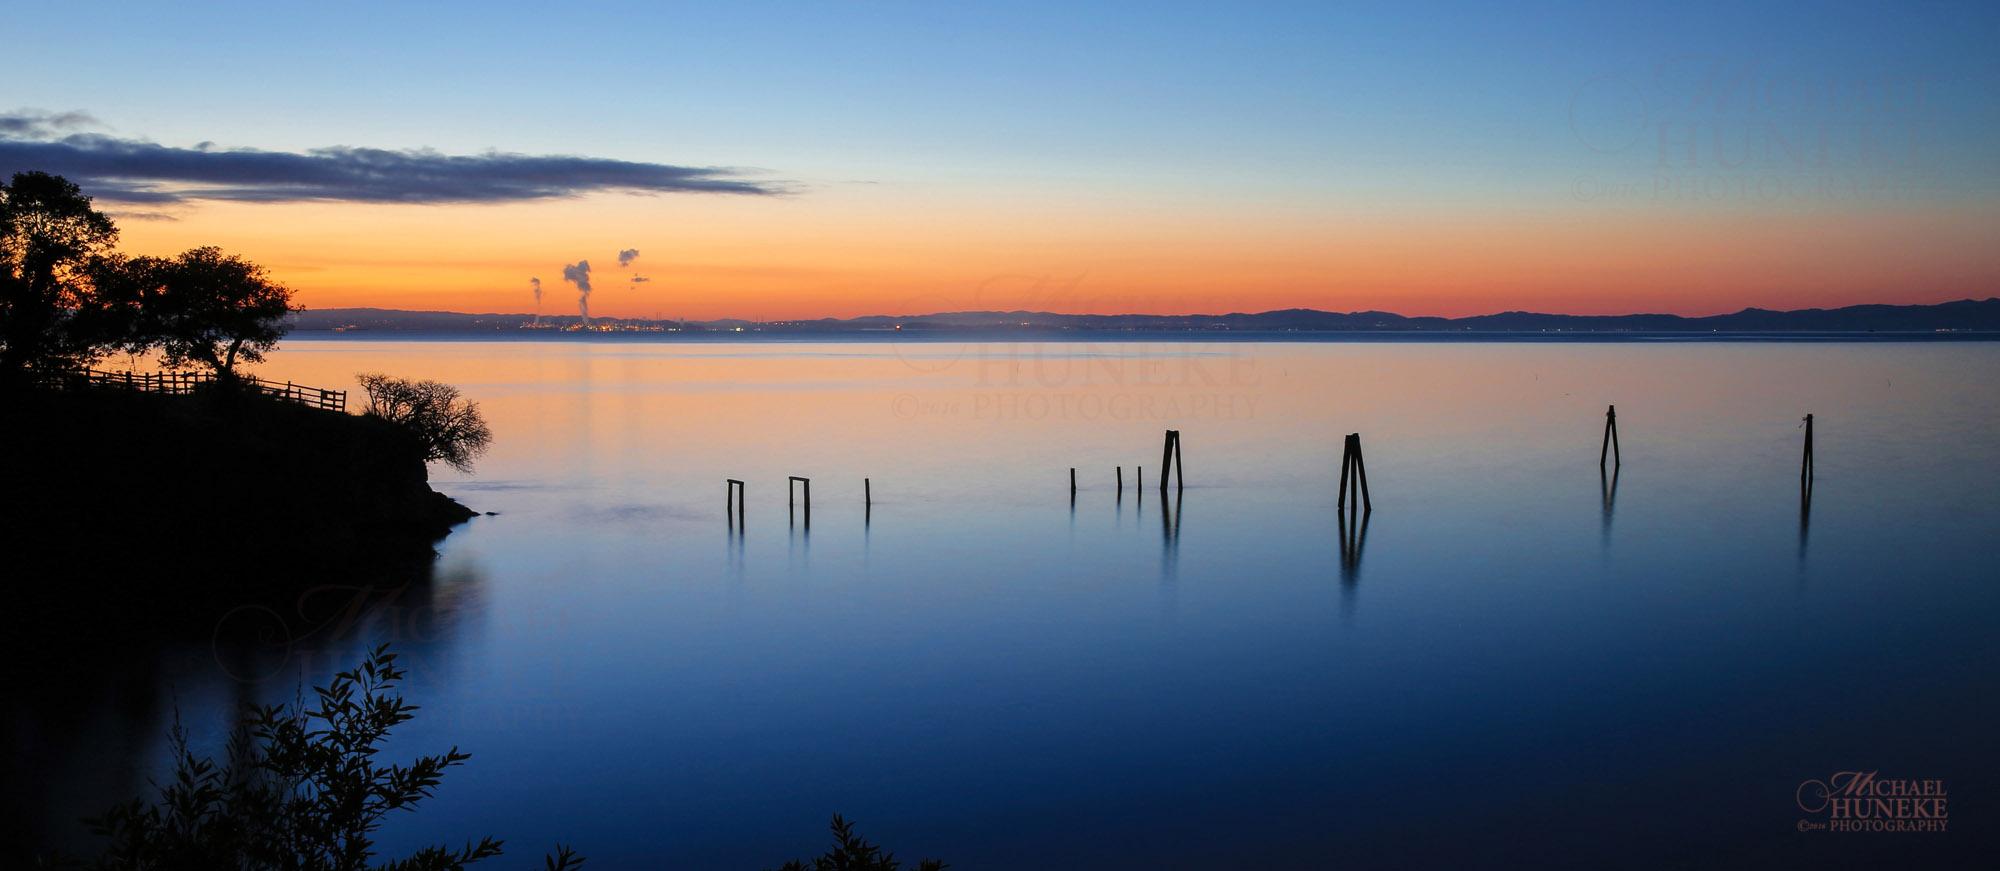 China_Beach_Sunrise_Pier_Posts-QN9A4793 2000 wide 72dpi high(9) wm.jpg